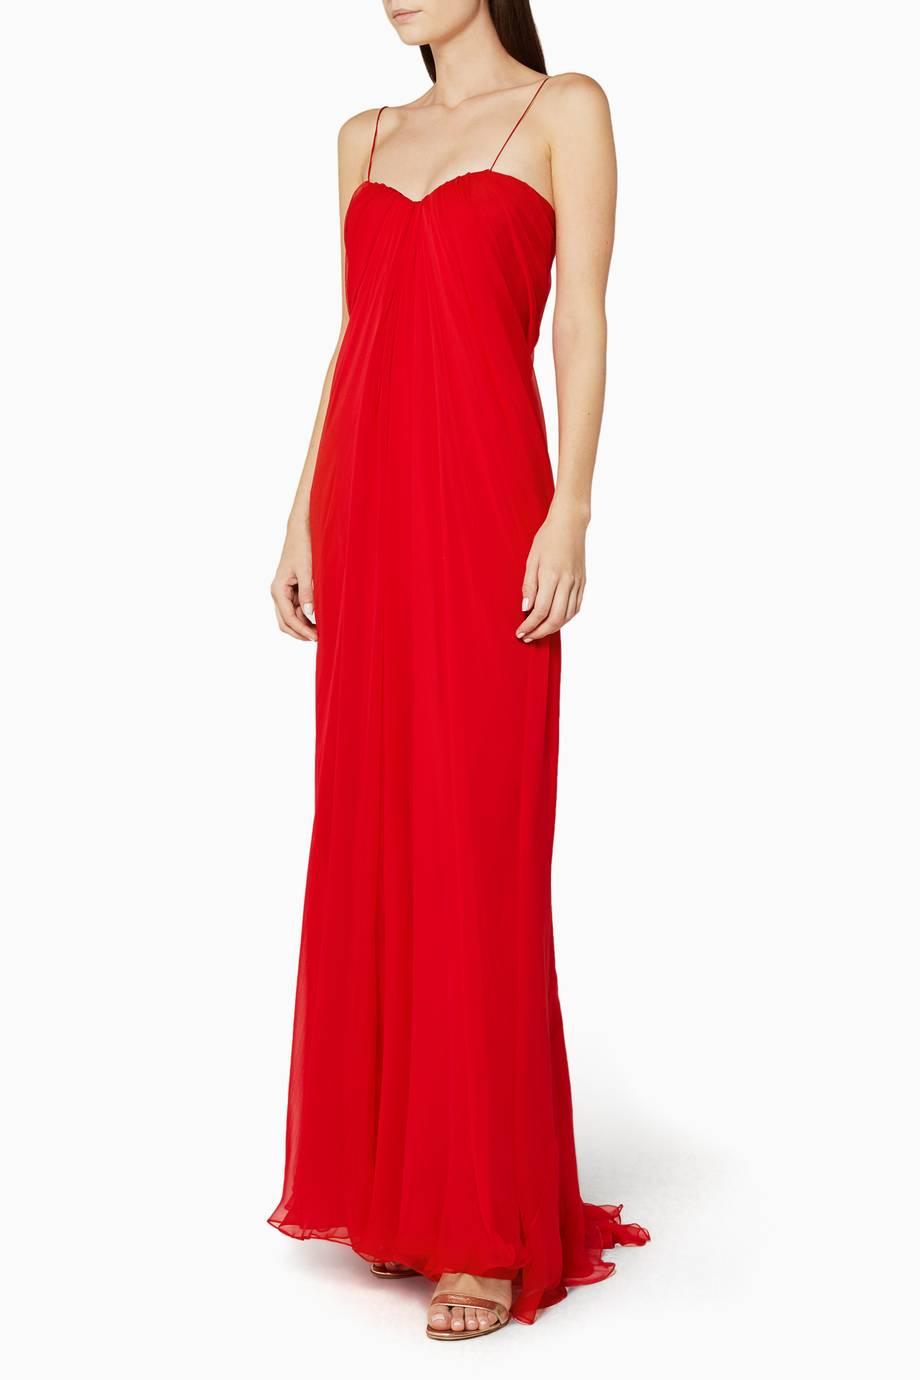 Shop luxury alexander mcqueen red draped bustier gown for Alexander mcqueen wedding dresses price